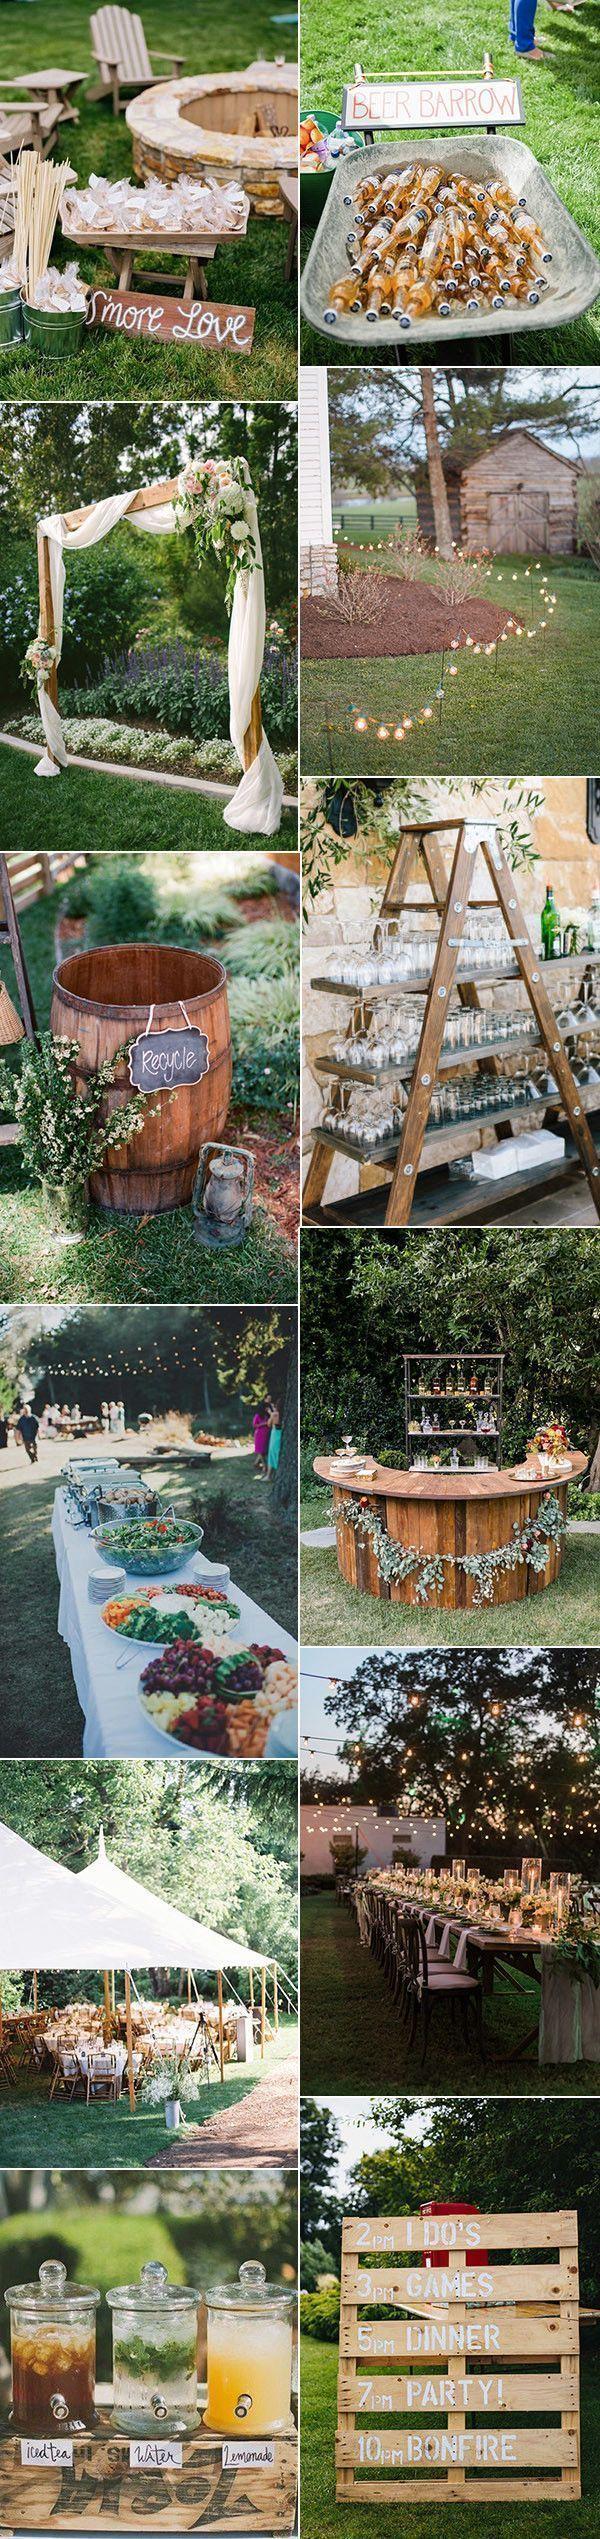 Wedding decorations in zambia november 2018  best Family u Wedding stuff images on Pinterest  Casamento